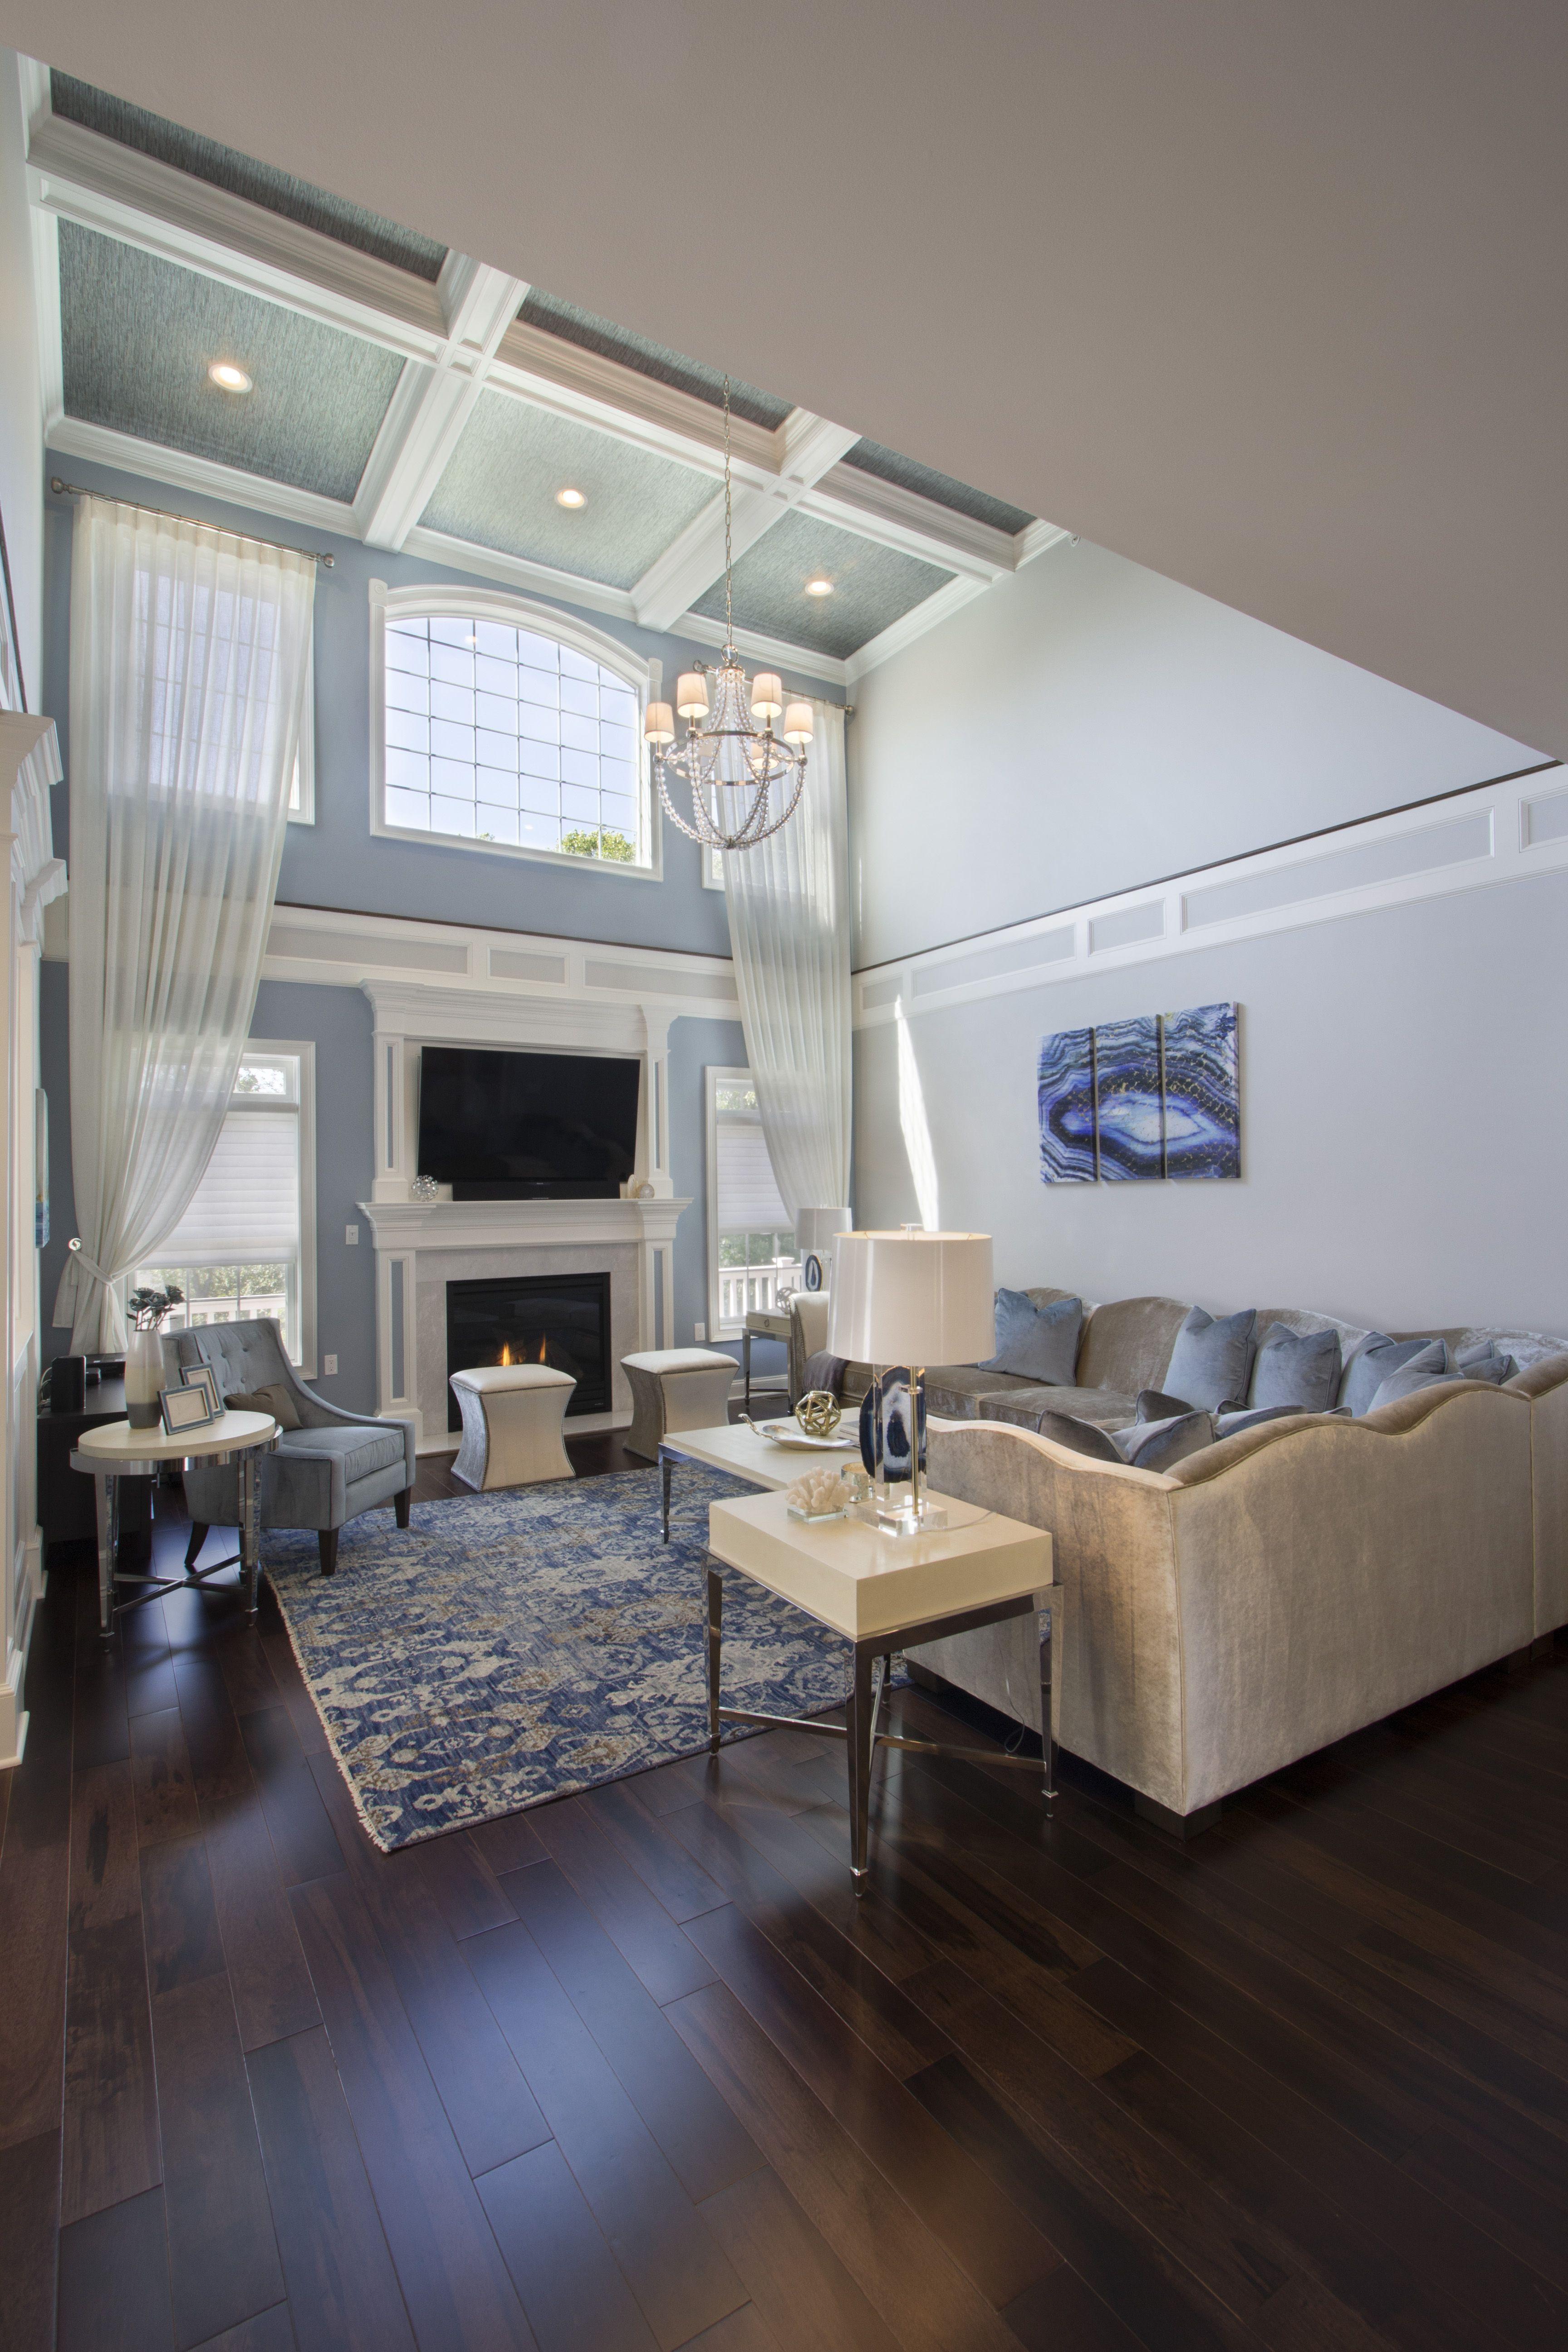 Glamilistic Living Room Designed By VDA In Morristown NJ